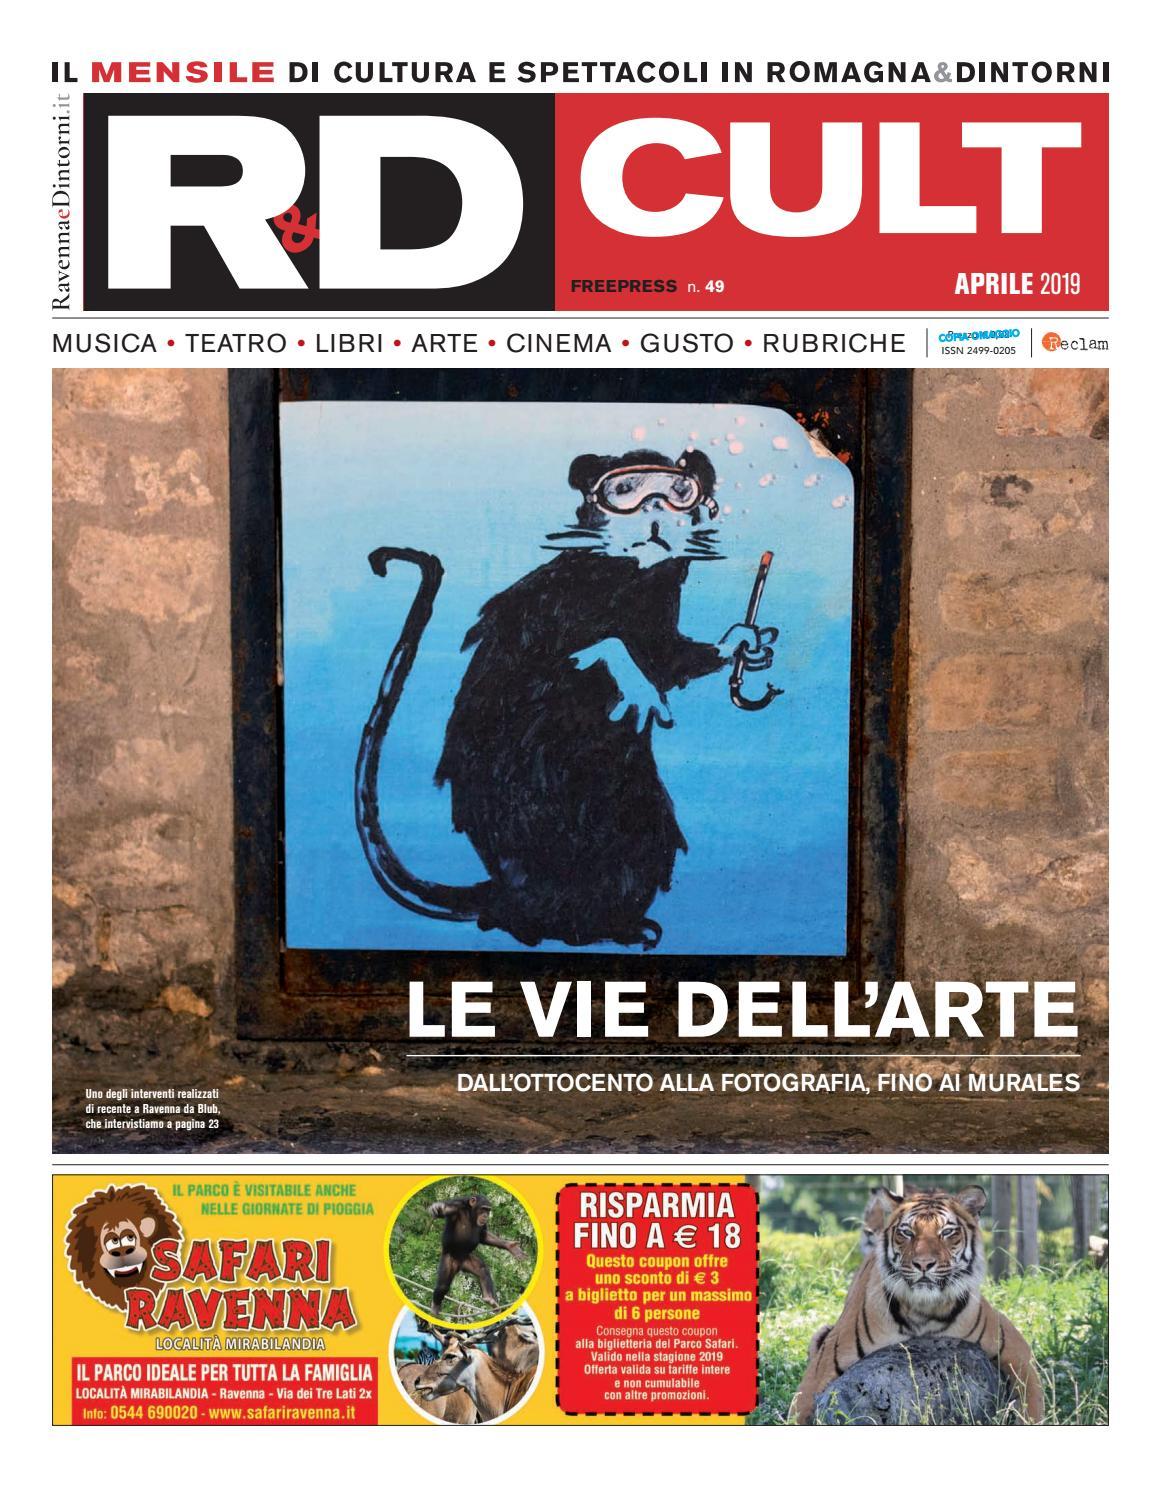 770e2cb3fc R&D CULT APRILE 2019 by Reclam Edizioni e Comunicazione - issuu